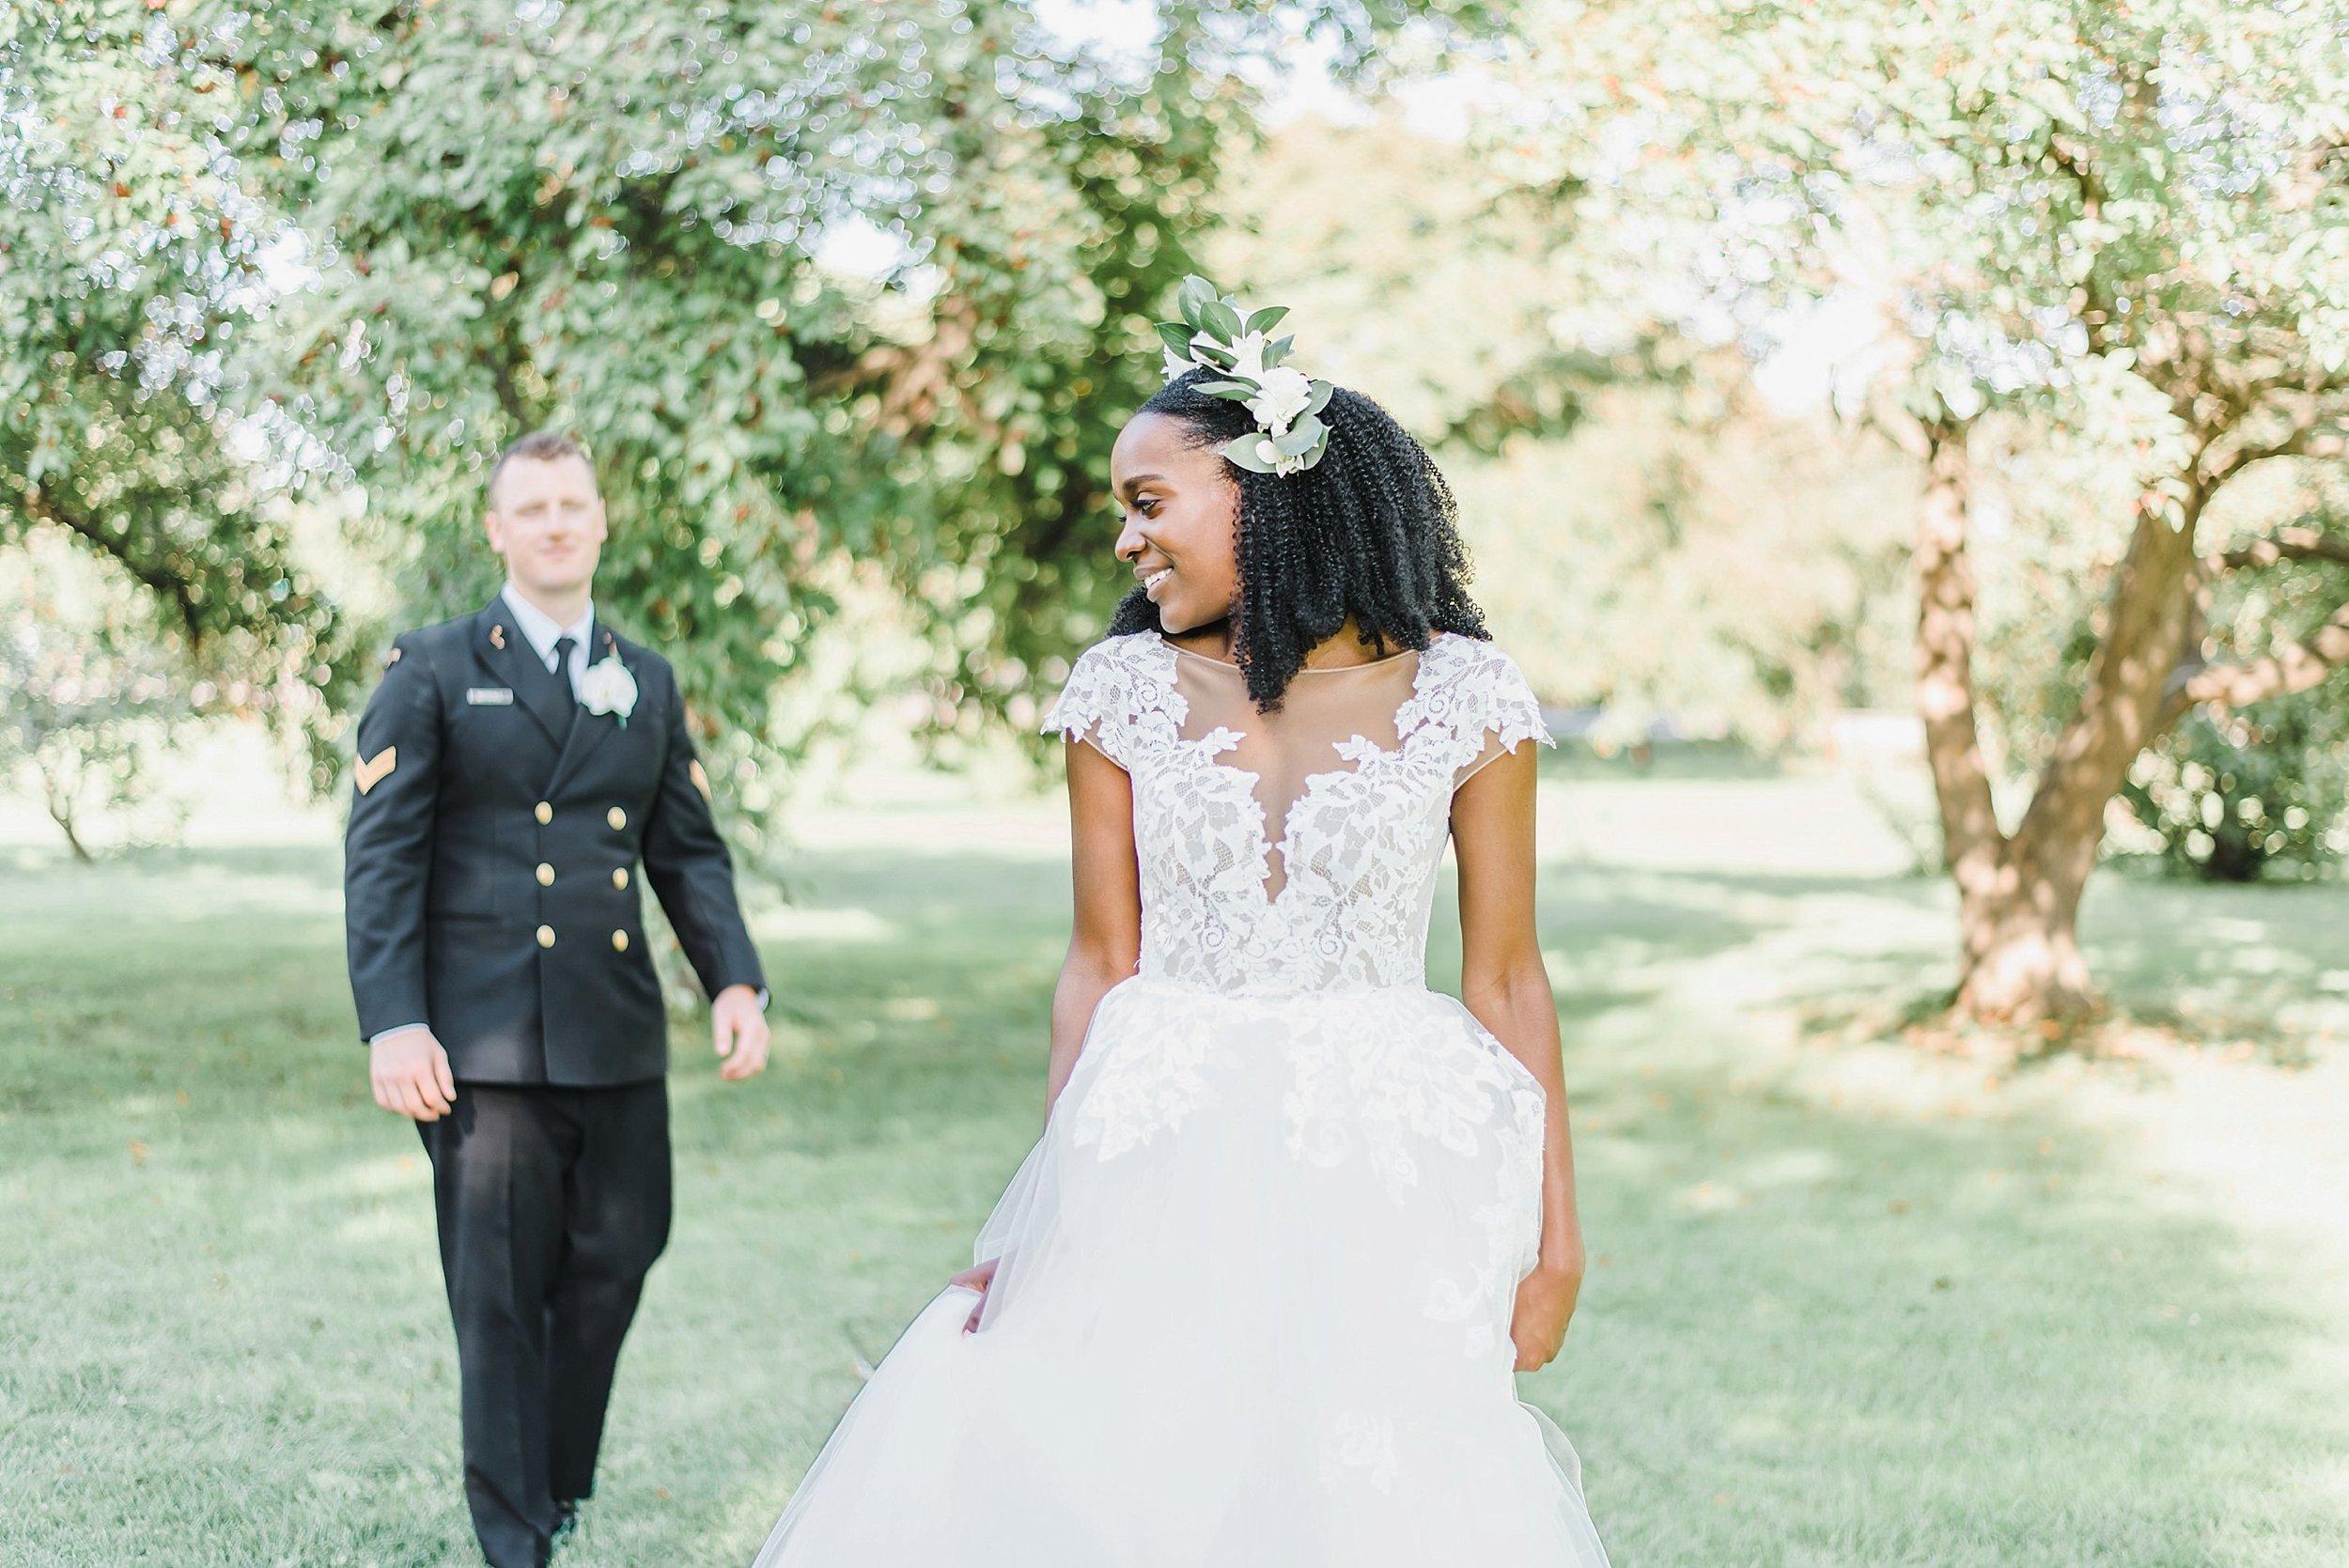 light airy indie fine art ottawa wedding photographer | Ali and Batoul Photography_1006.jpg